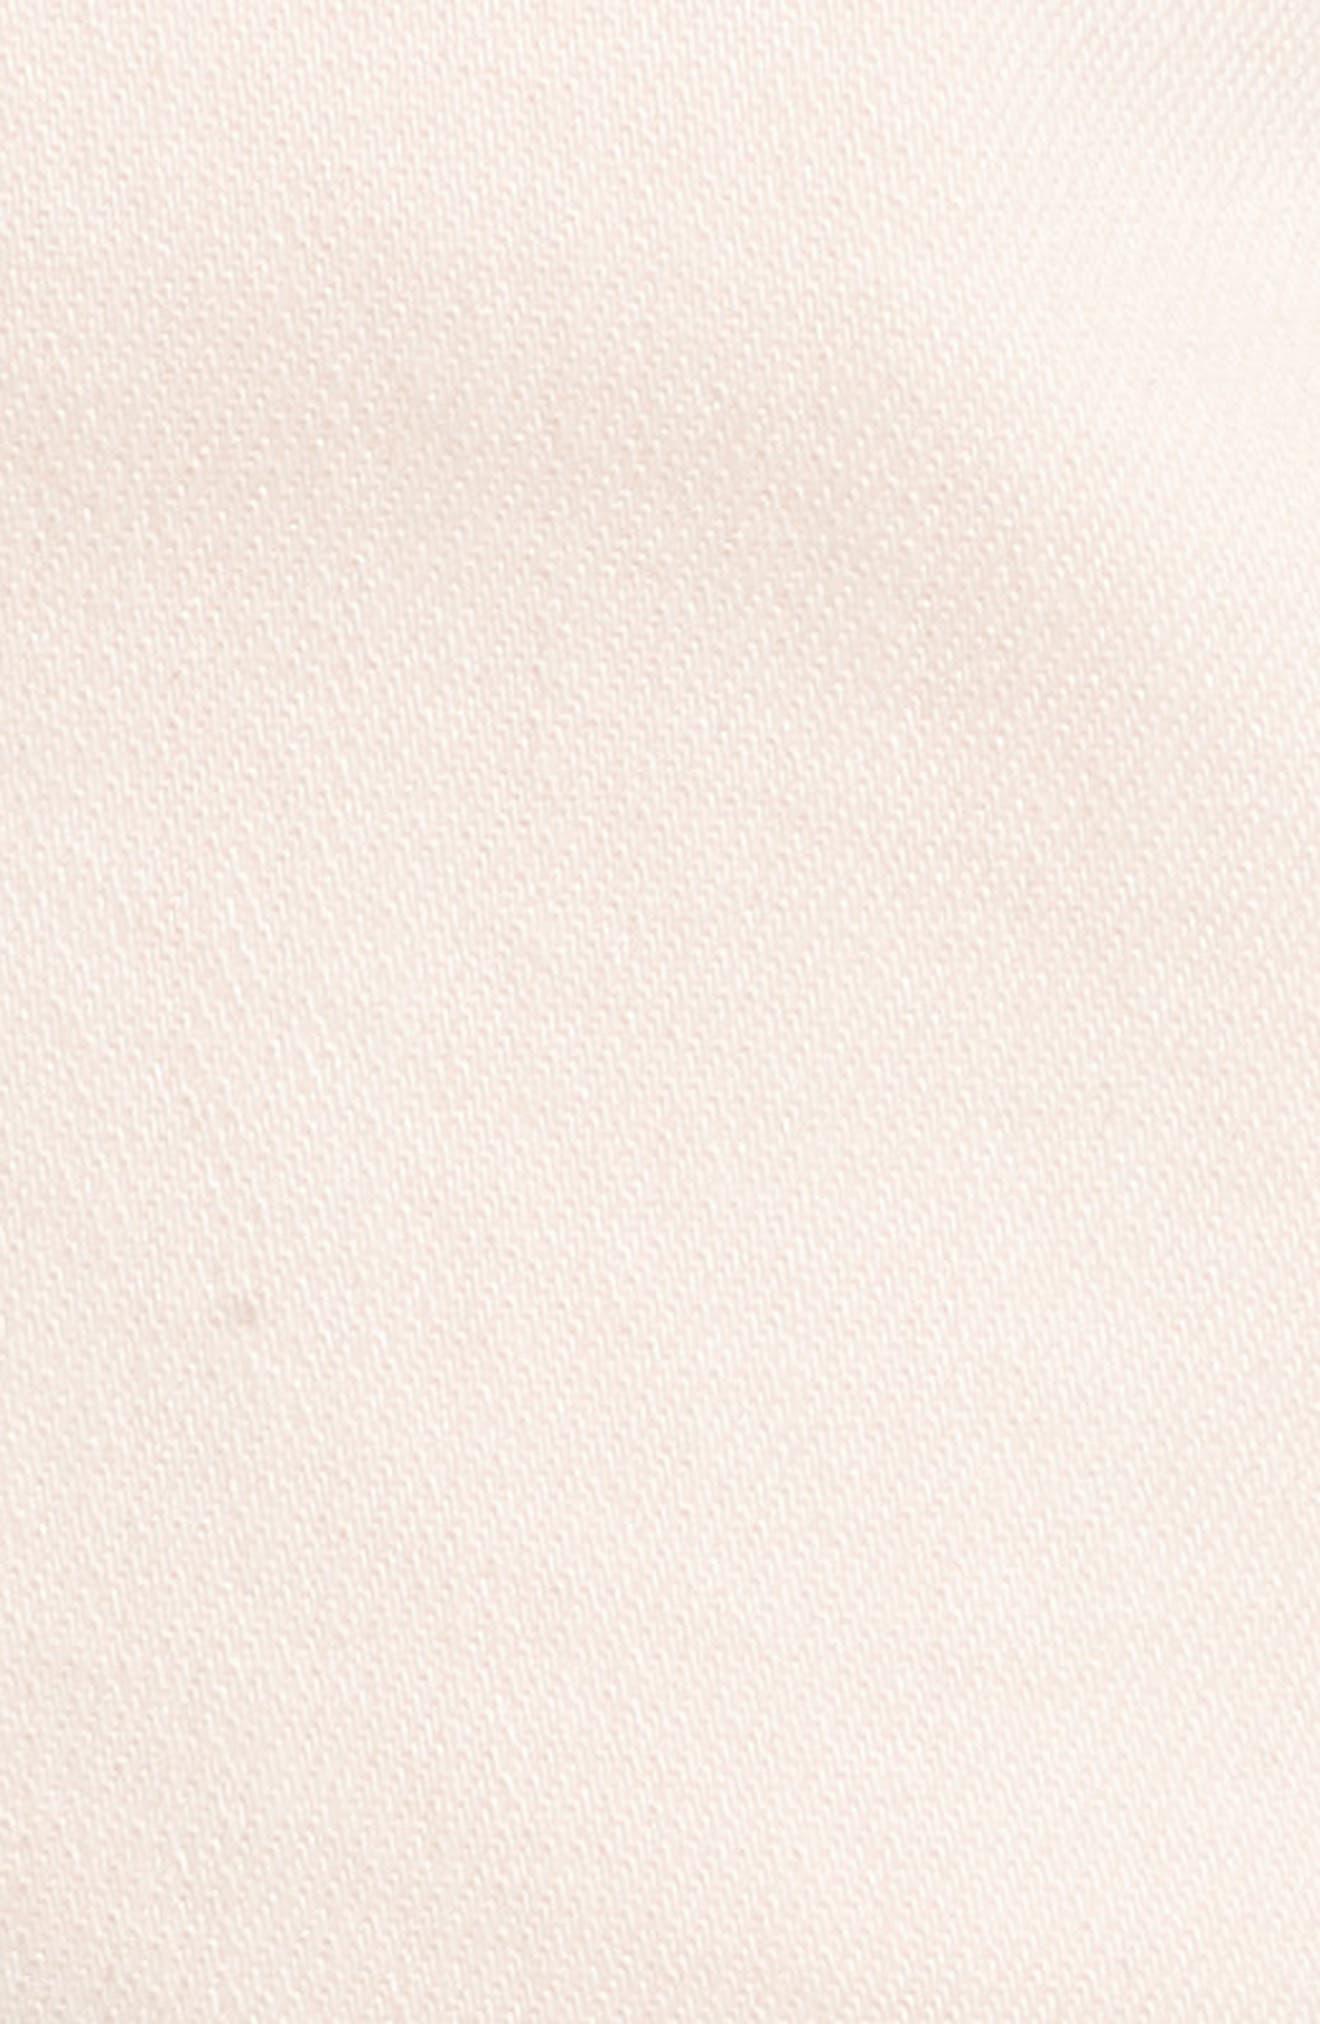 Renee Notch Raw Hem Denim Shorts,                             Alternate thumbnail 5, color,                             Blush Pink